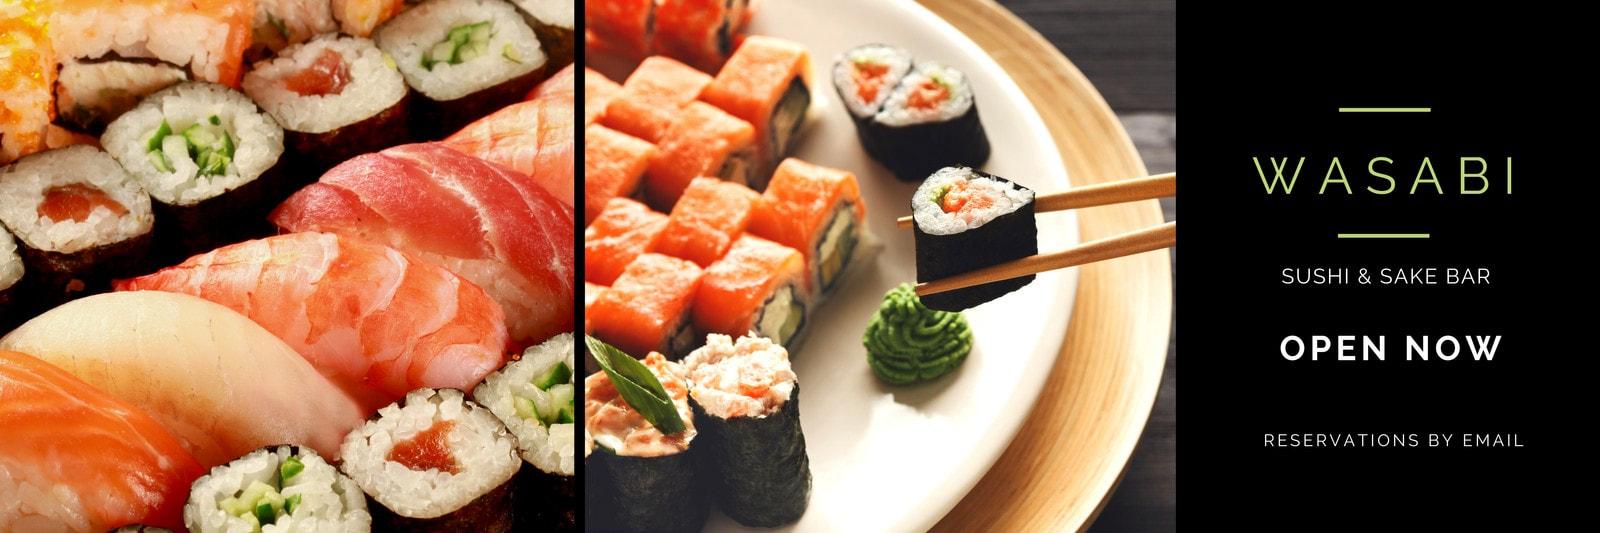 Japanese Food Sushi Bar Twitter Header